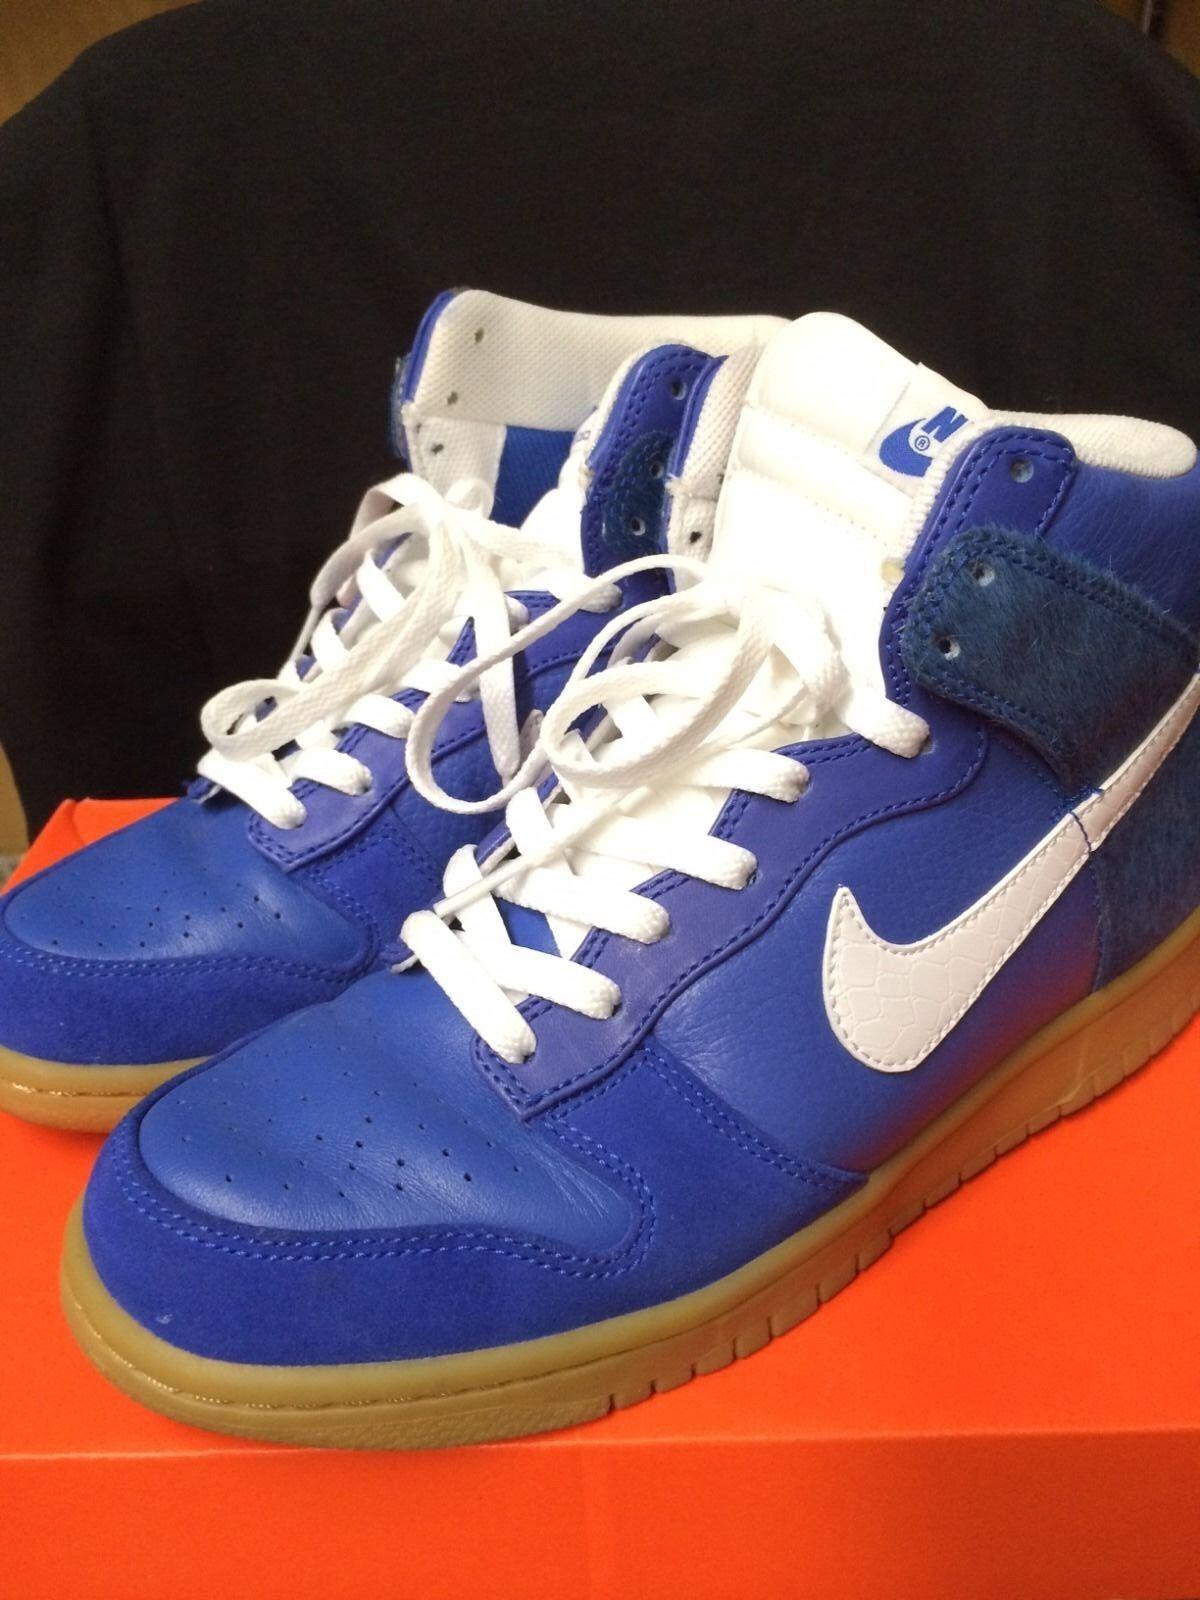 Nike Dunk High Premium 317892 412 Size 8